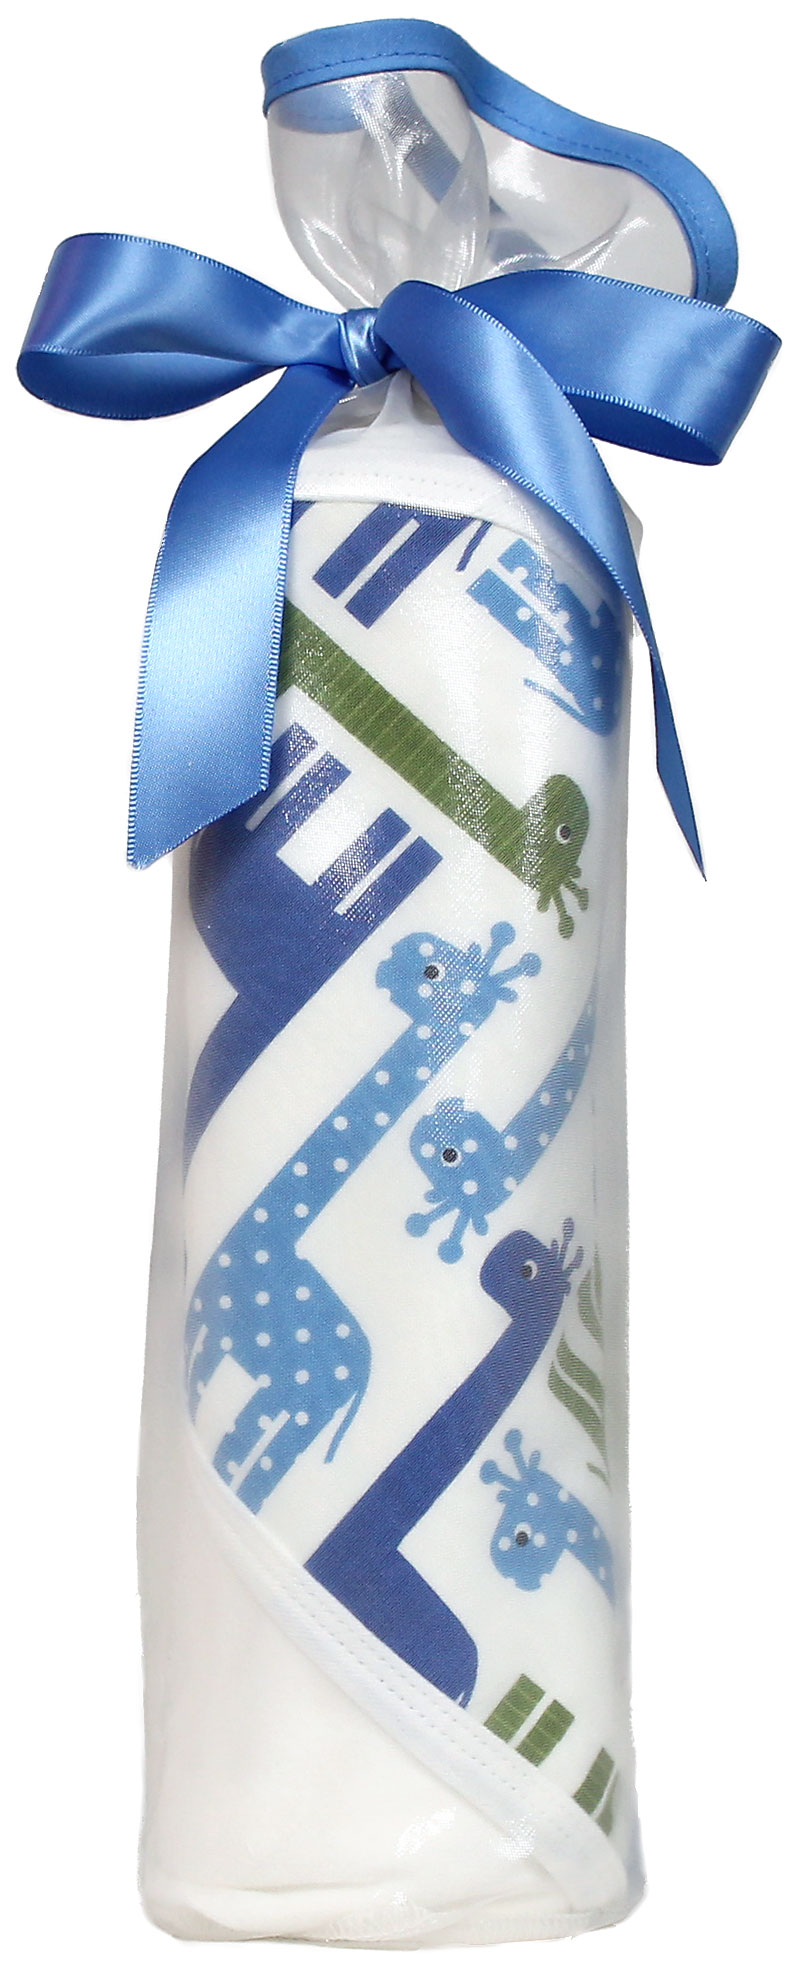 Treasured Giraffe Blanket Boy Gift Set